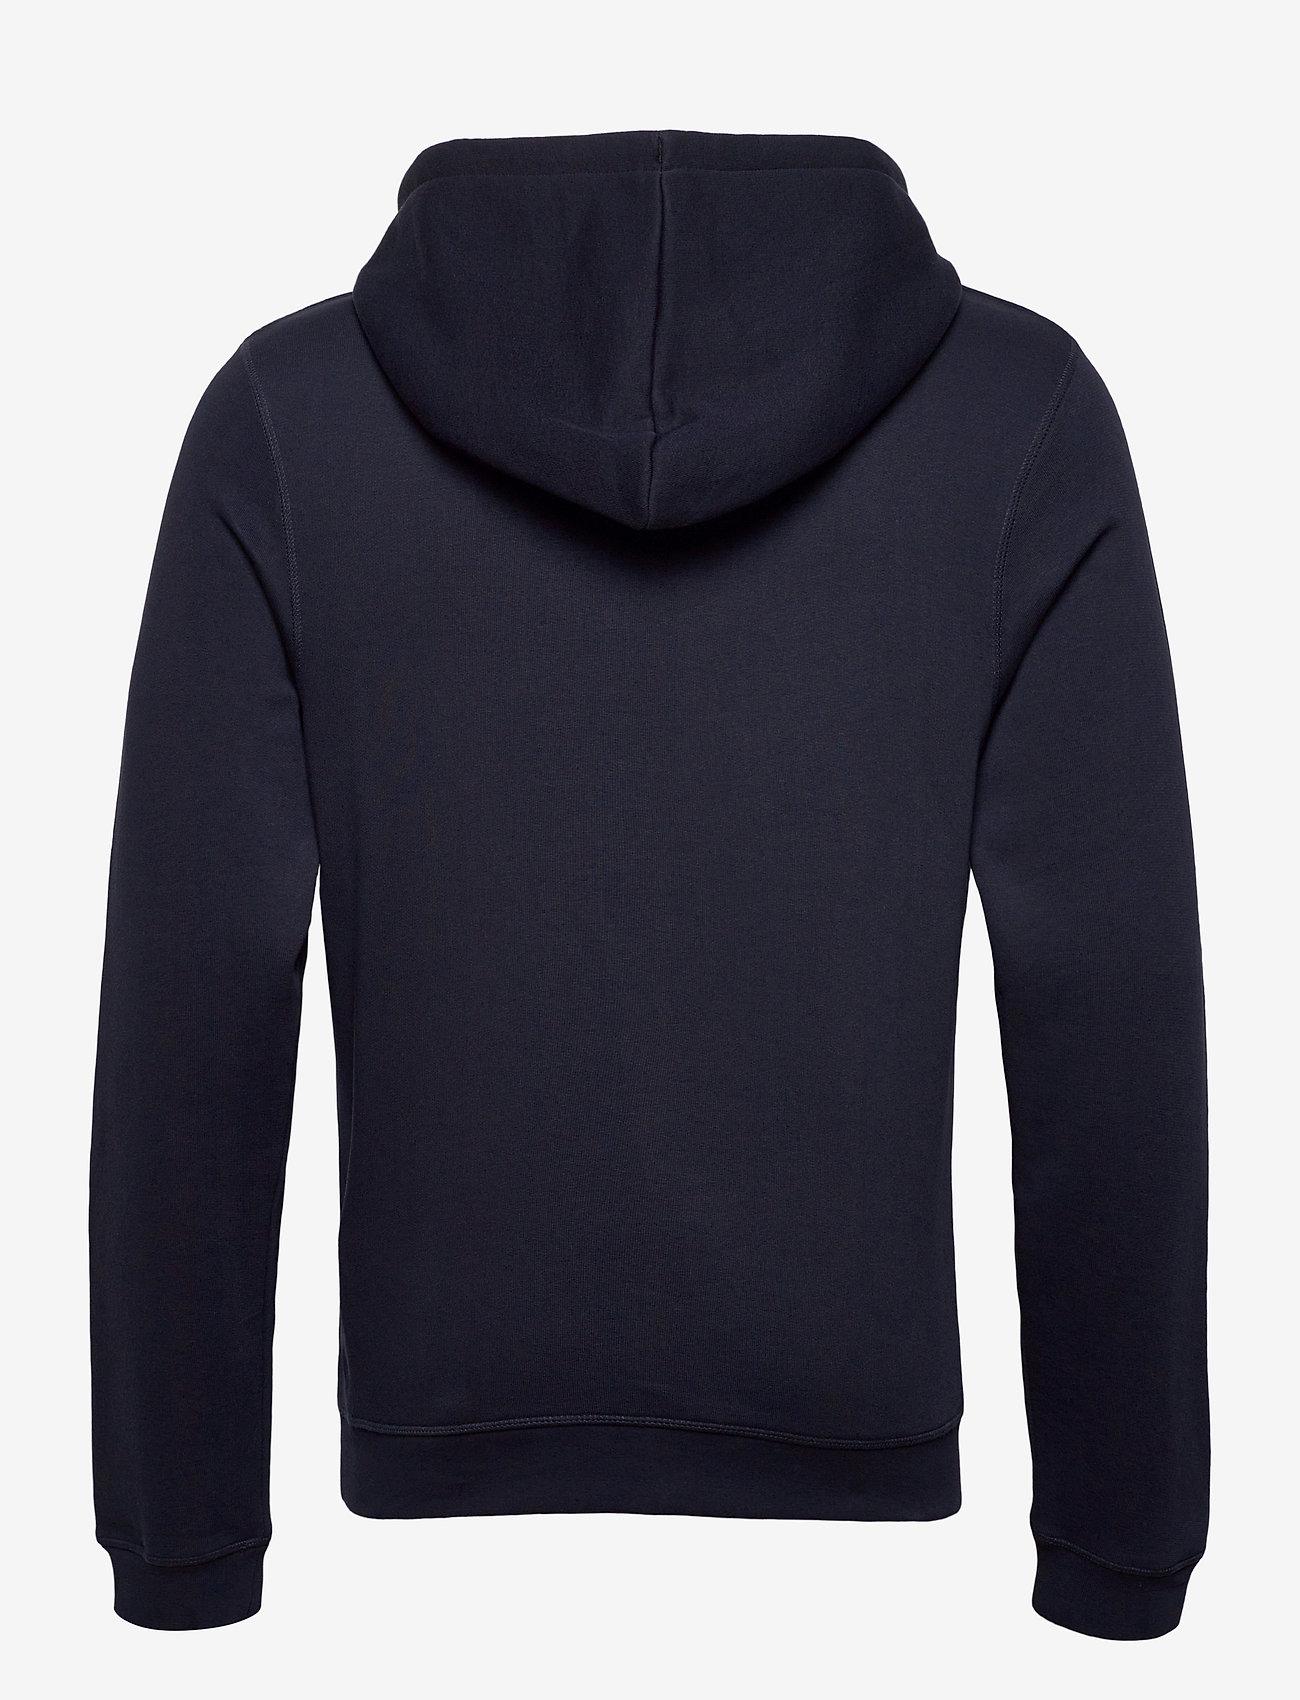 Lexington Clothing Perry Organic Cotton Hood - Sweatshirts DARK BLUE - Menn Klær